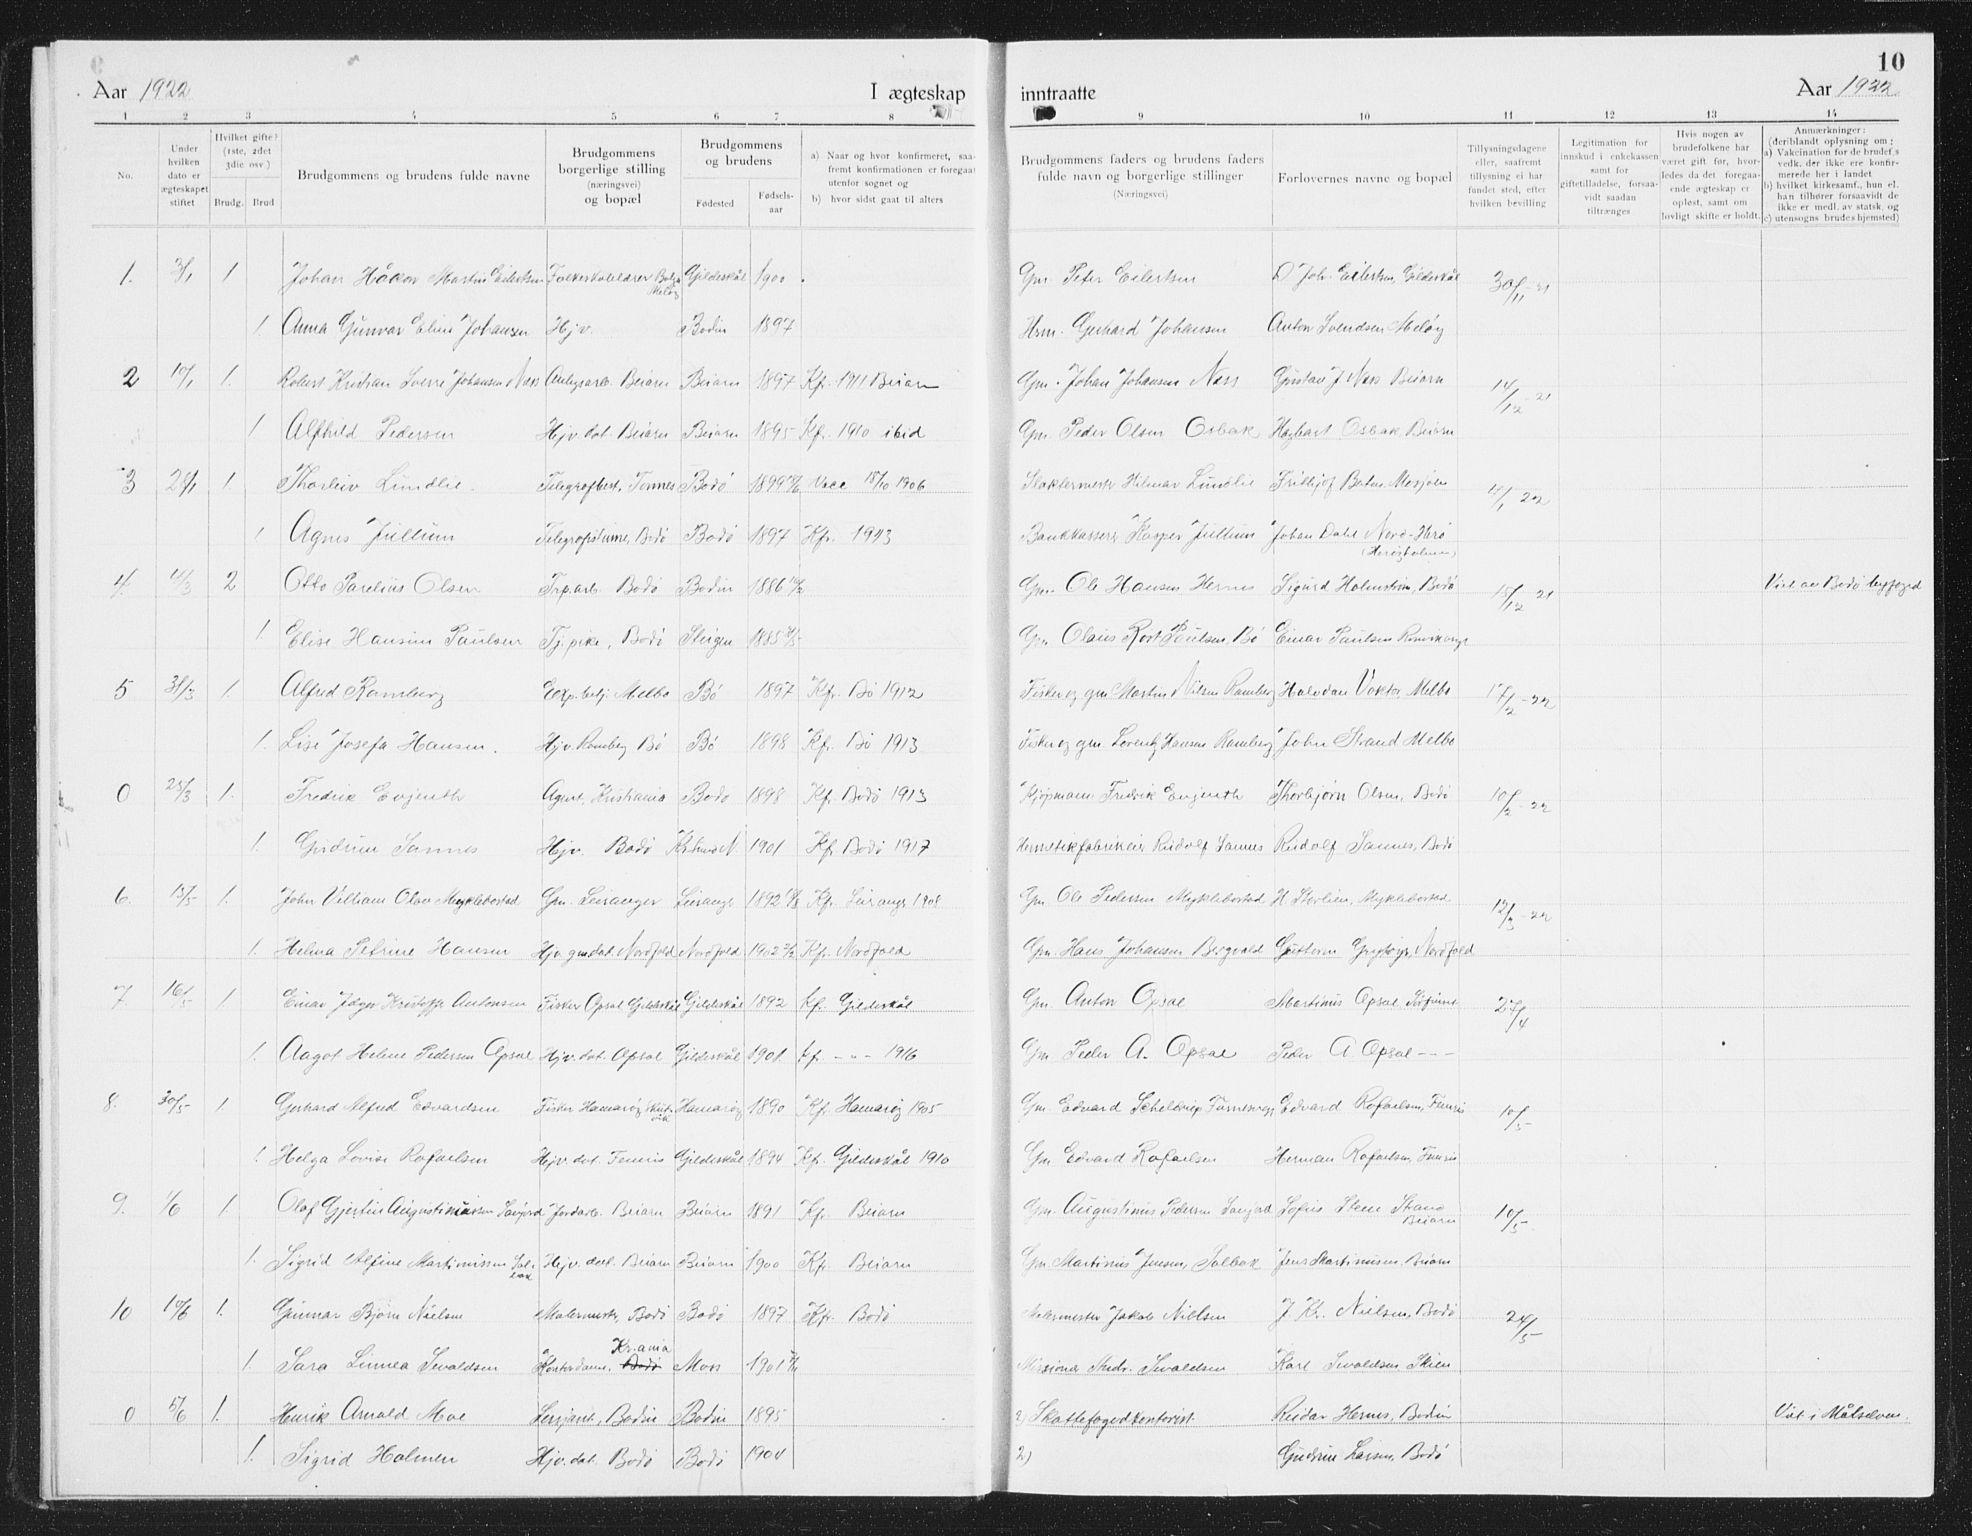 SAT, Ministerialprotokoller, klokkerbøker og fødselsregistre - Nordland, 801/L0036: Klokkerbok nr. 801C11, 1920-1934, s. 10